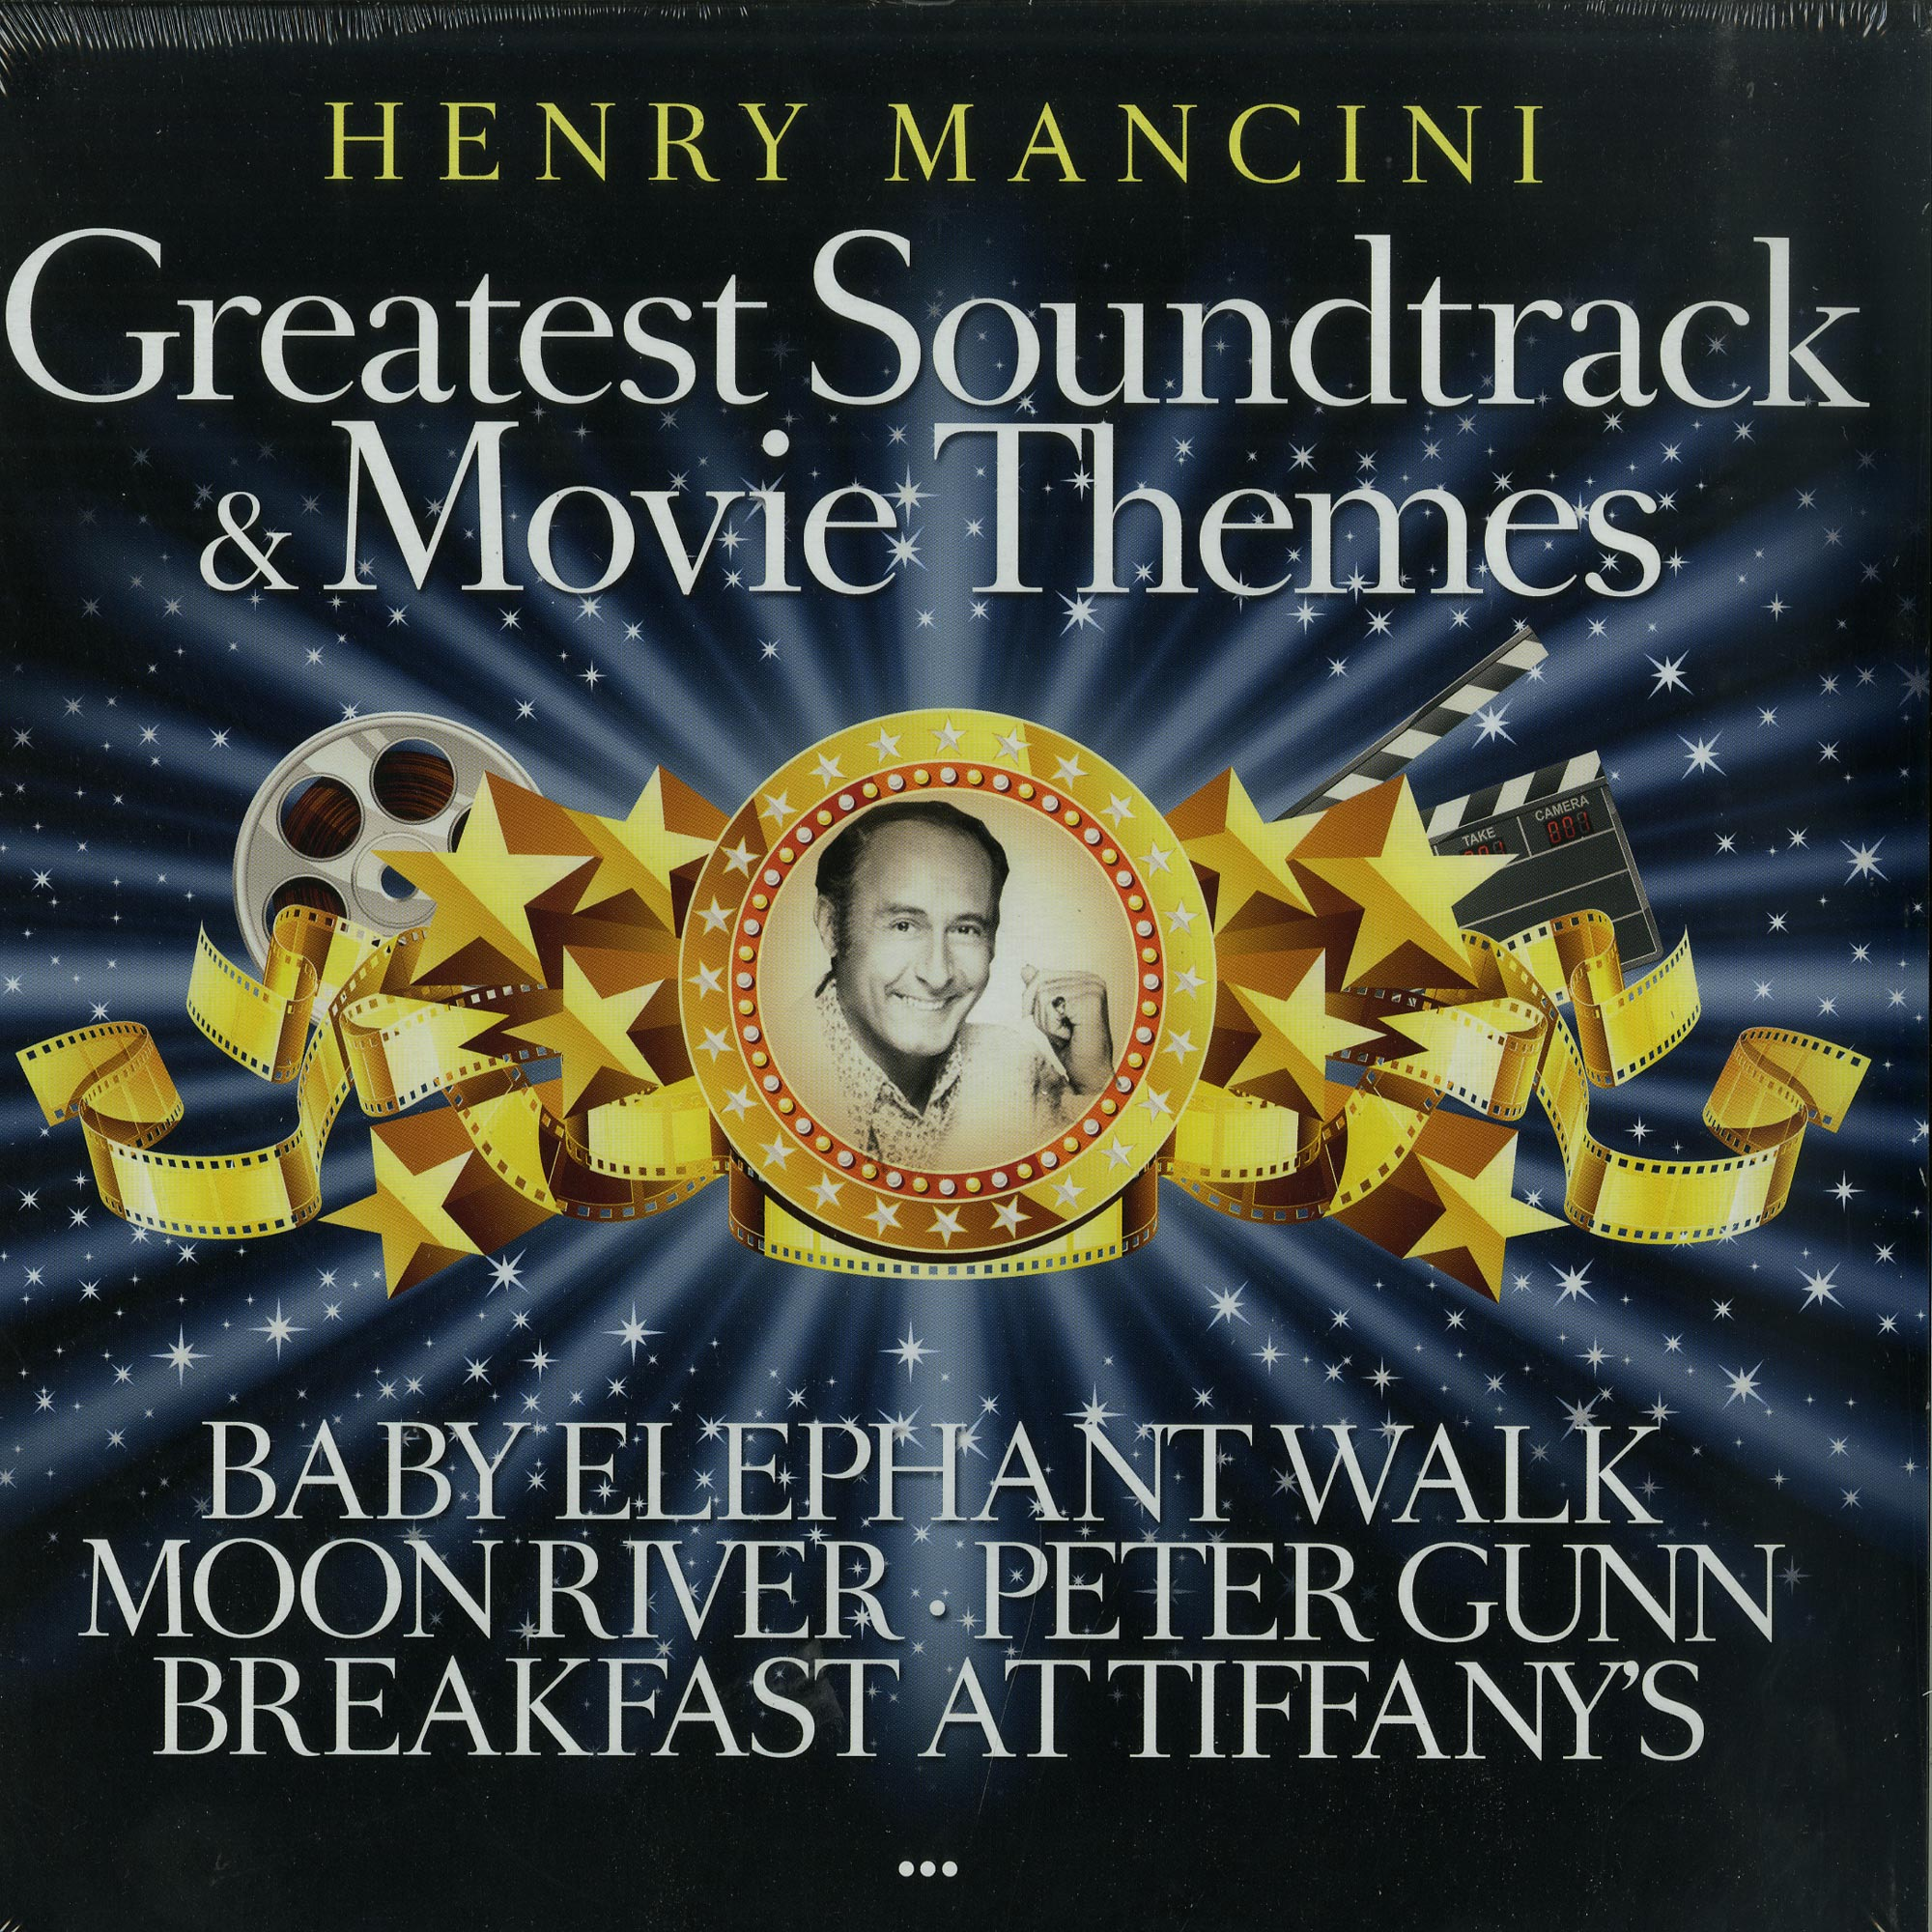 Henry Mancini - GREATEST SOUNDTRACKS & MOVIE THEMES